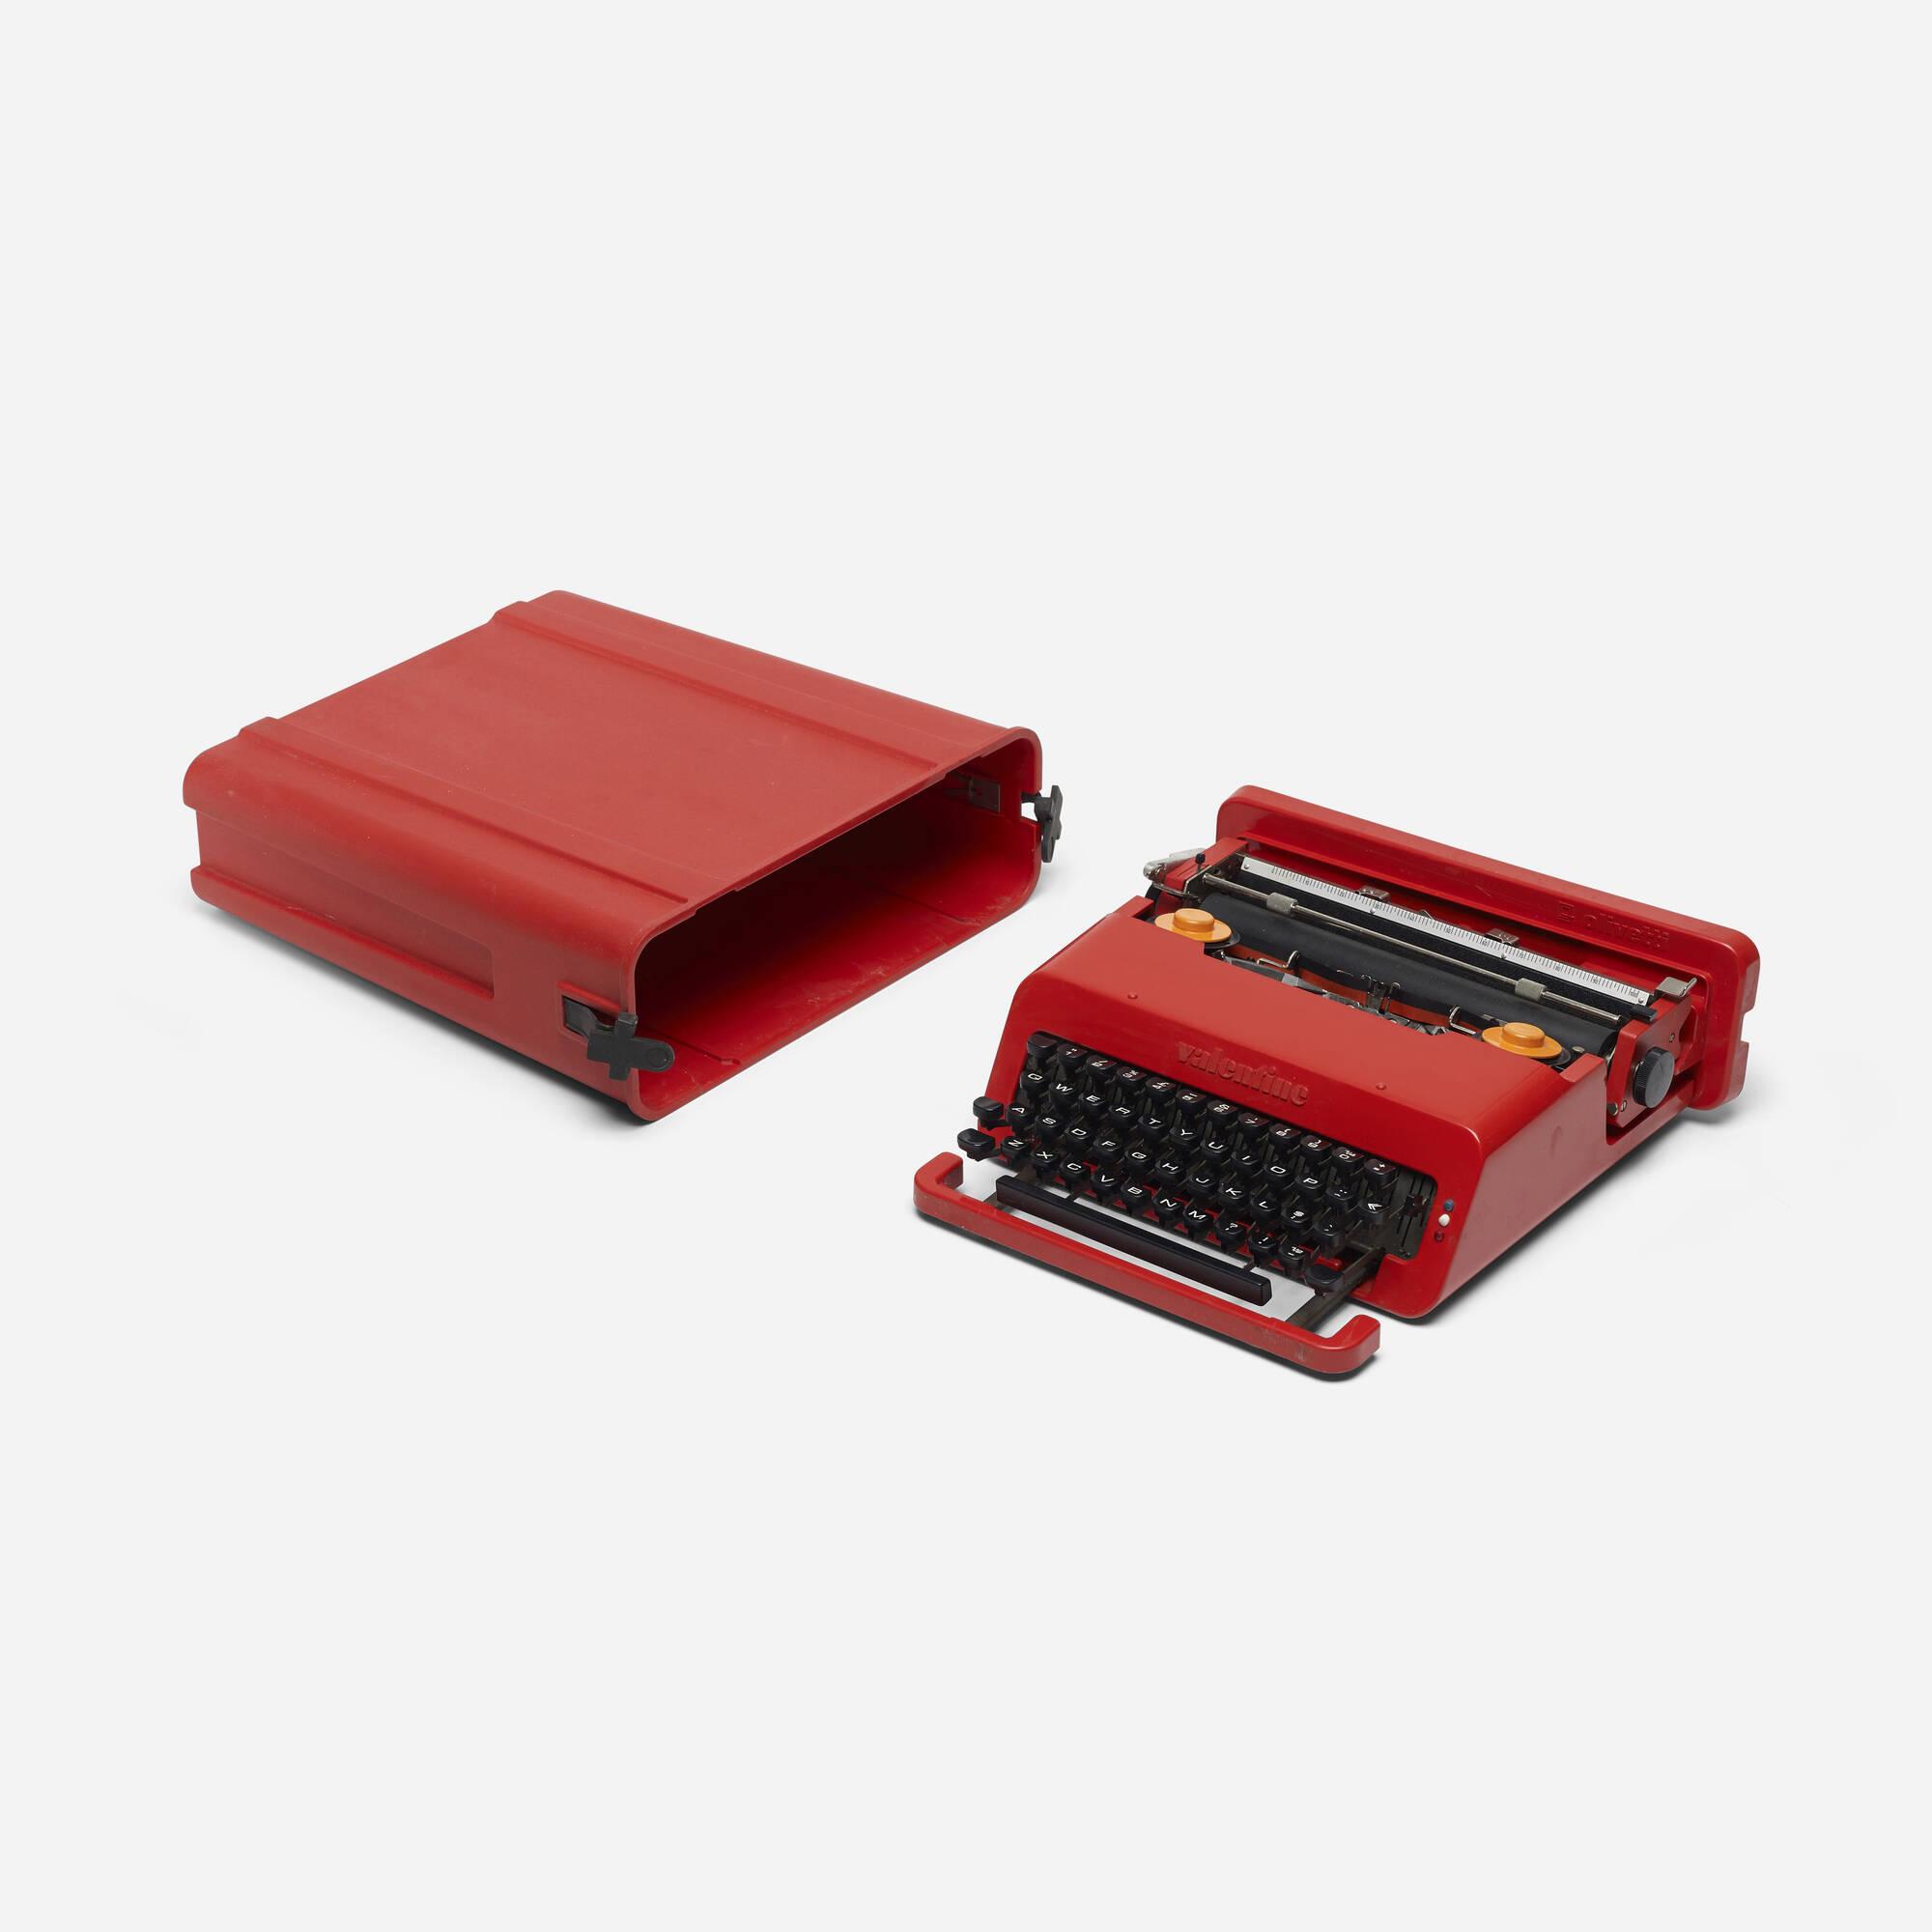 737: Ettore Sottsass / Valentine typewriter (1 of 2)